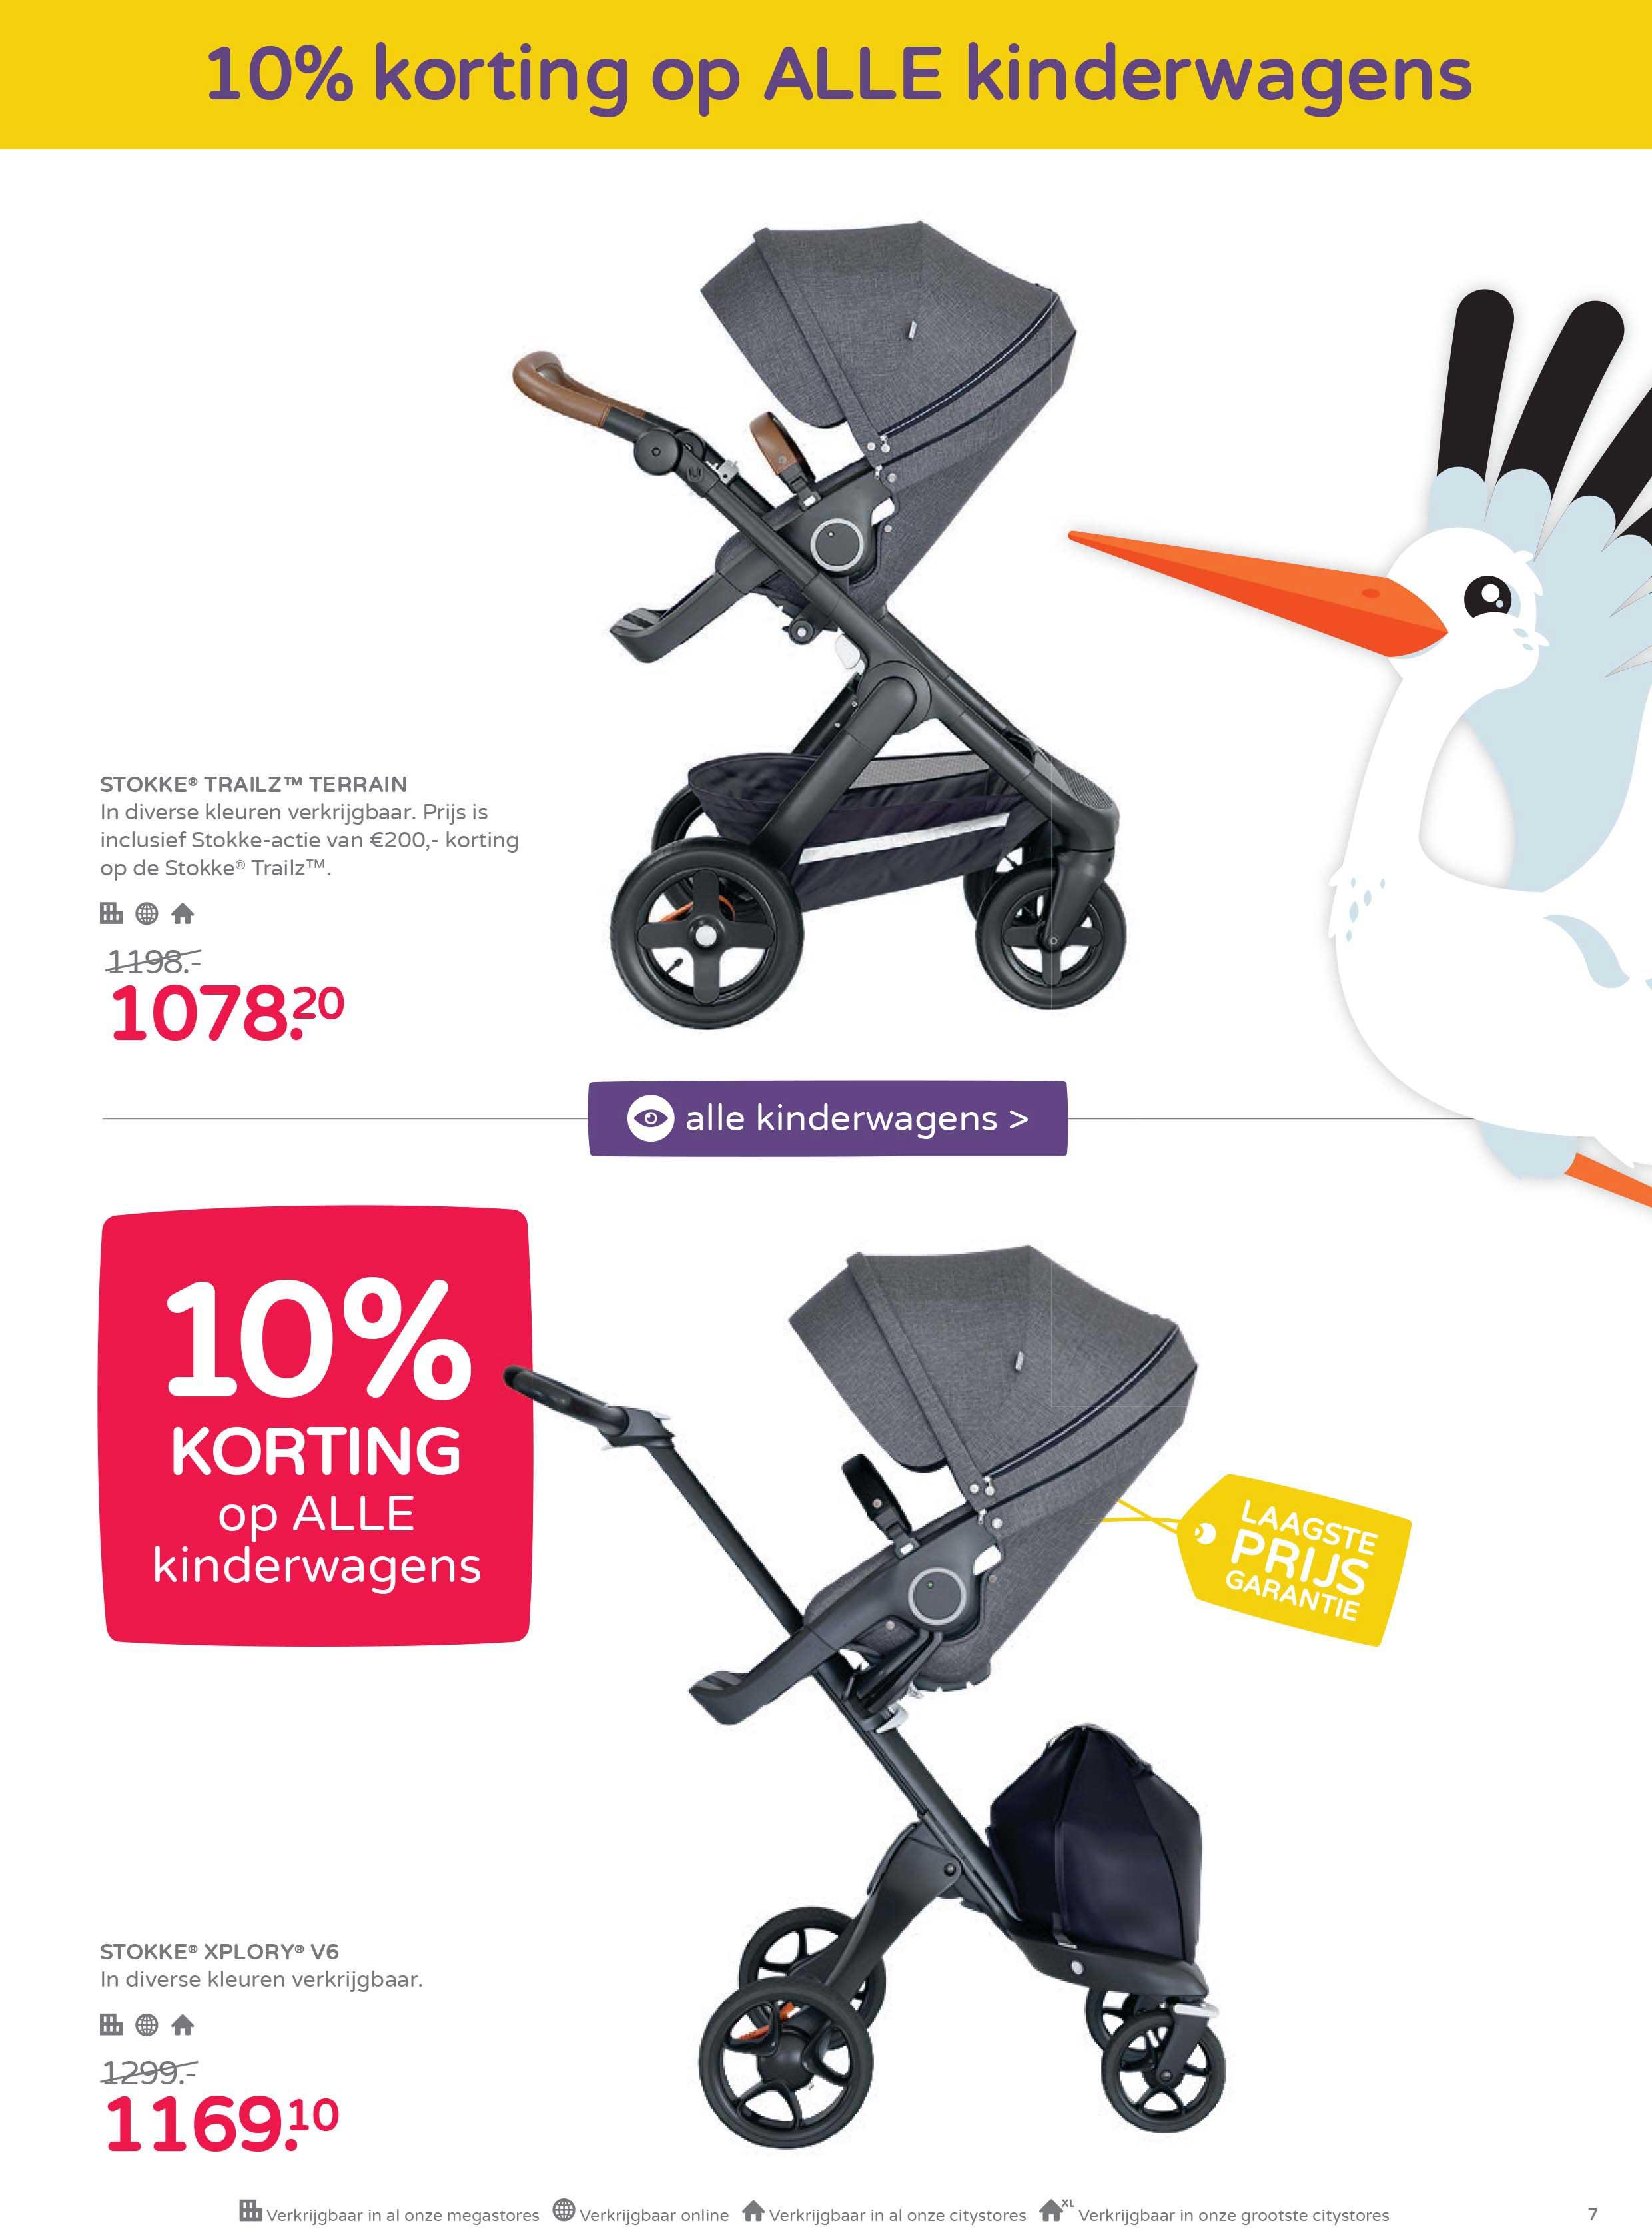 Prénatal 10% Korting Op ALLE Kinderwagens